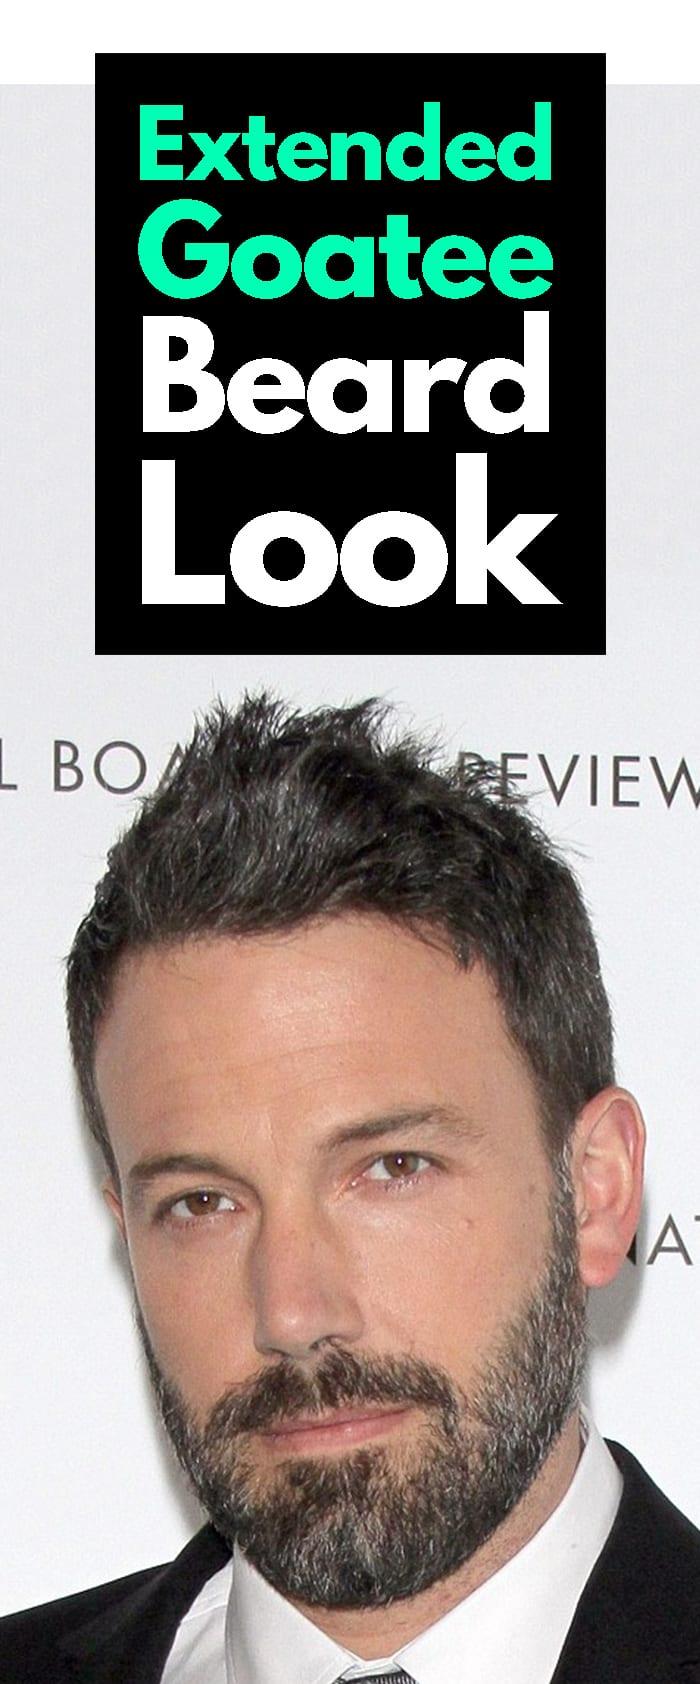 Extended Goatee Beard Look.